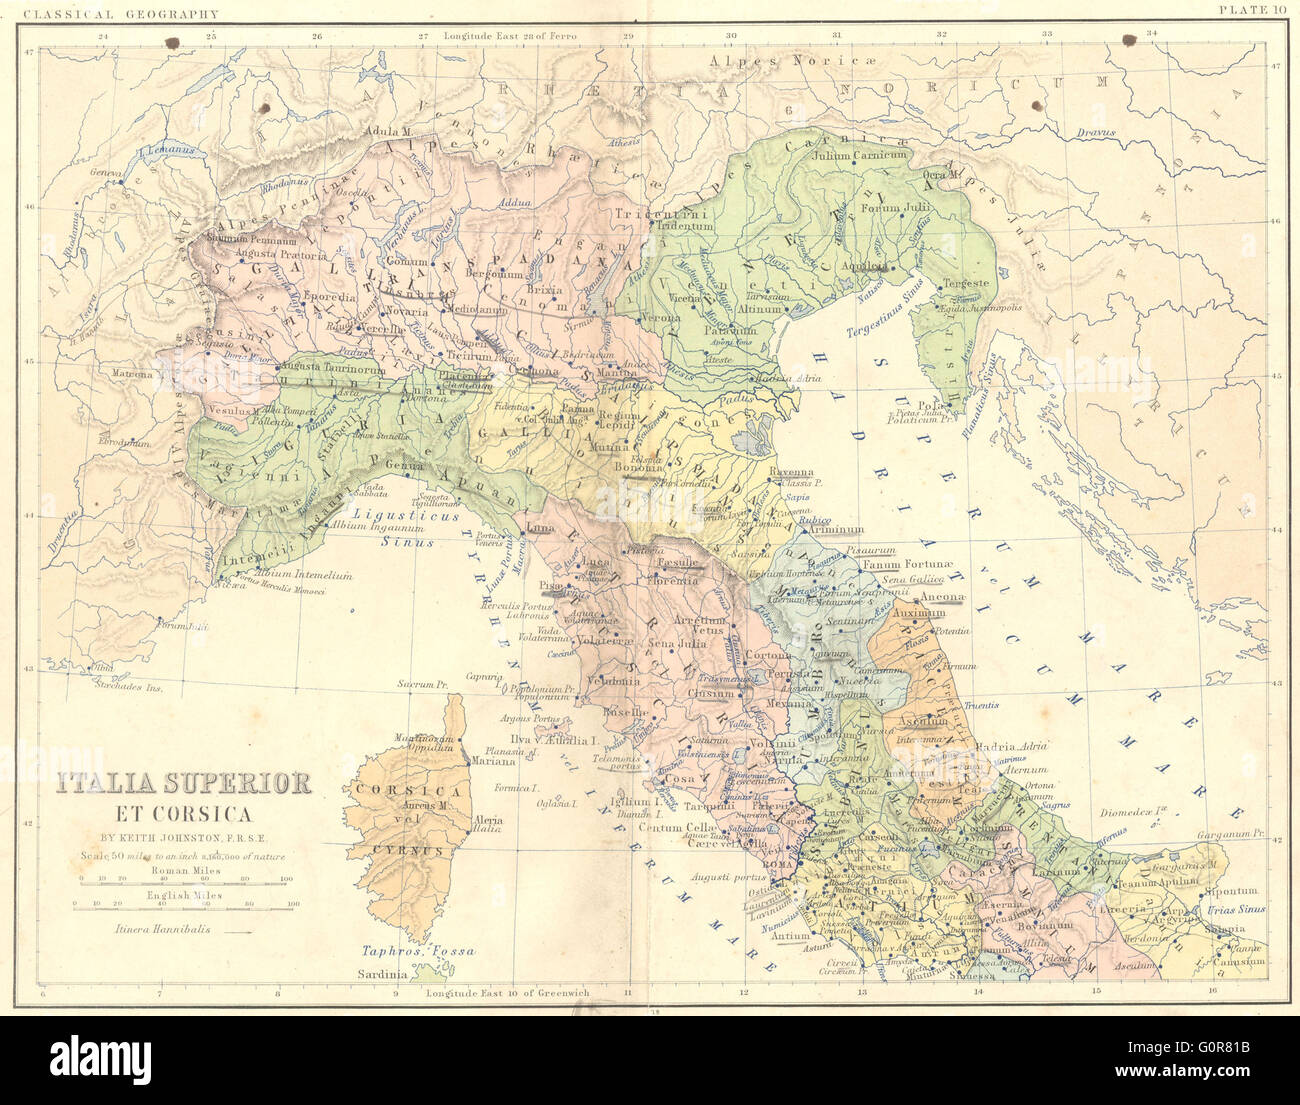 Italy Italia Superior Corsica 1880 Antique Map Stock Photo